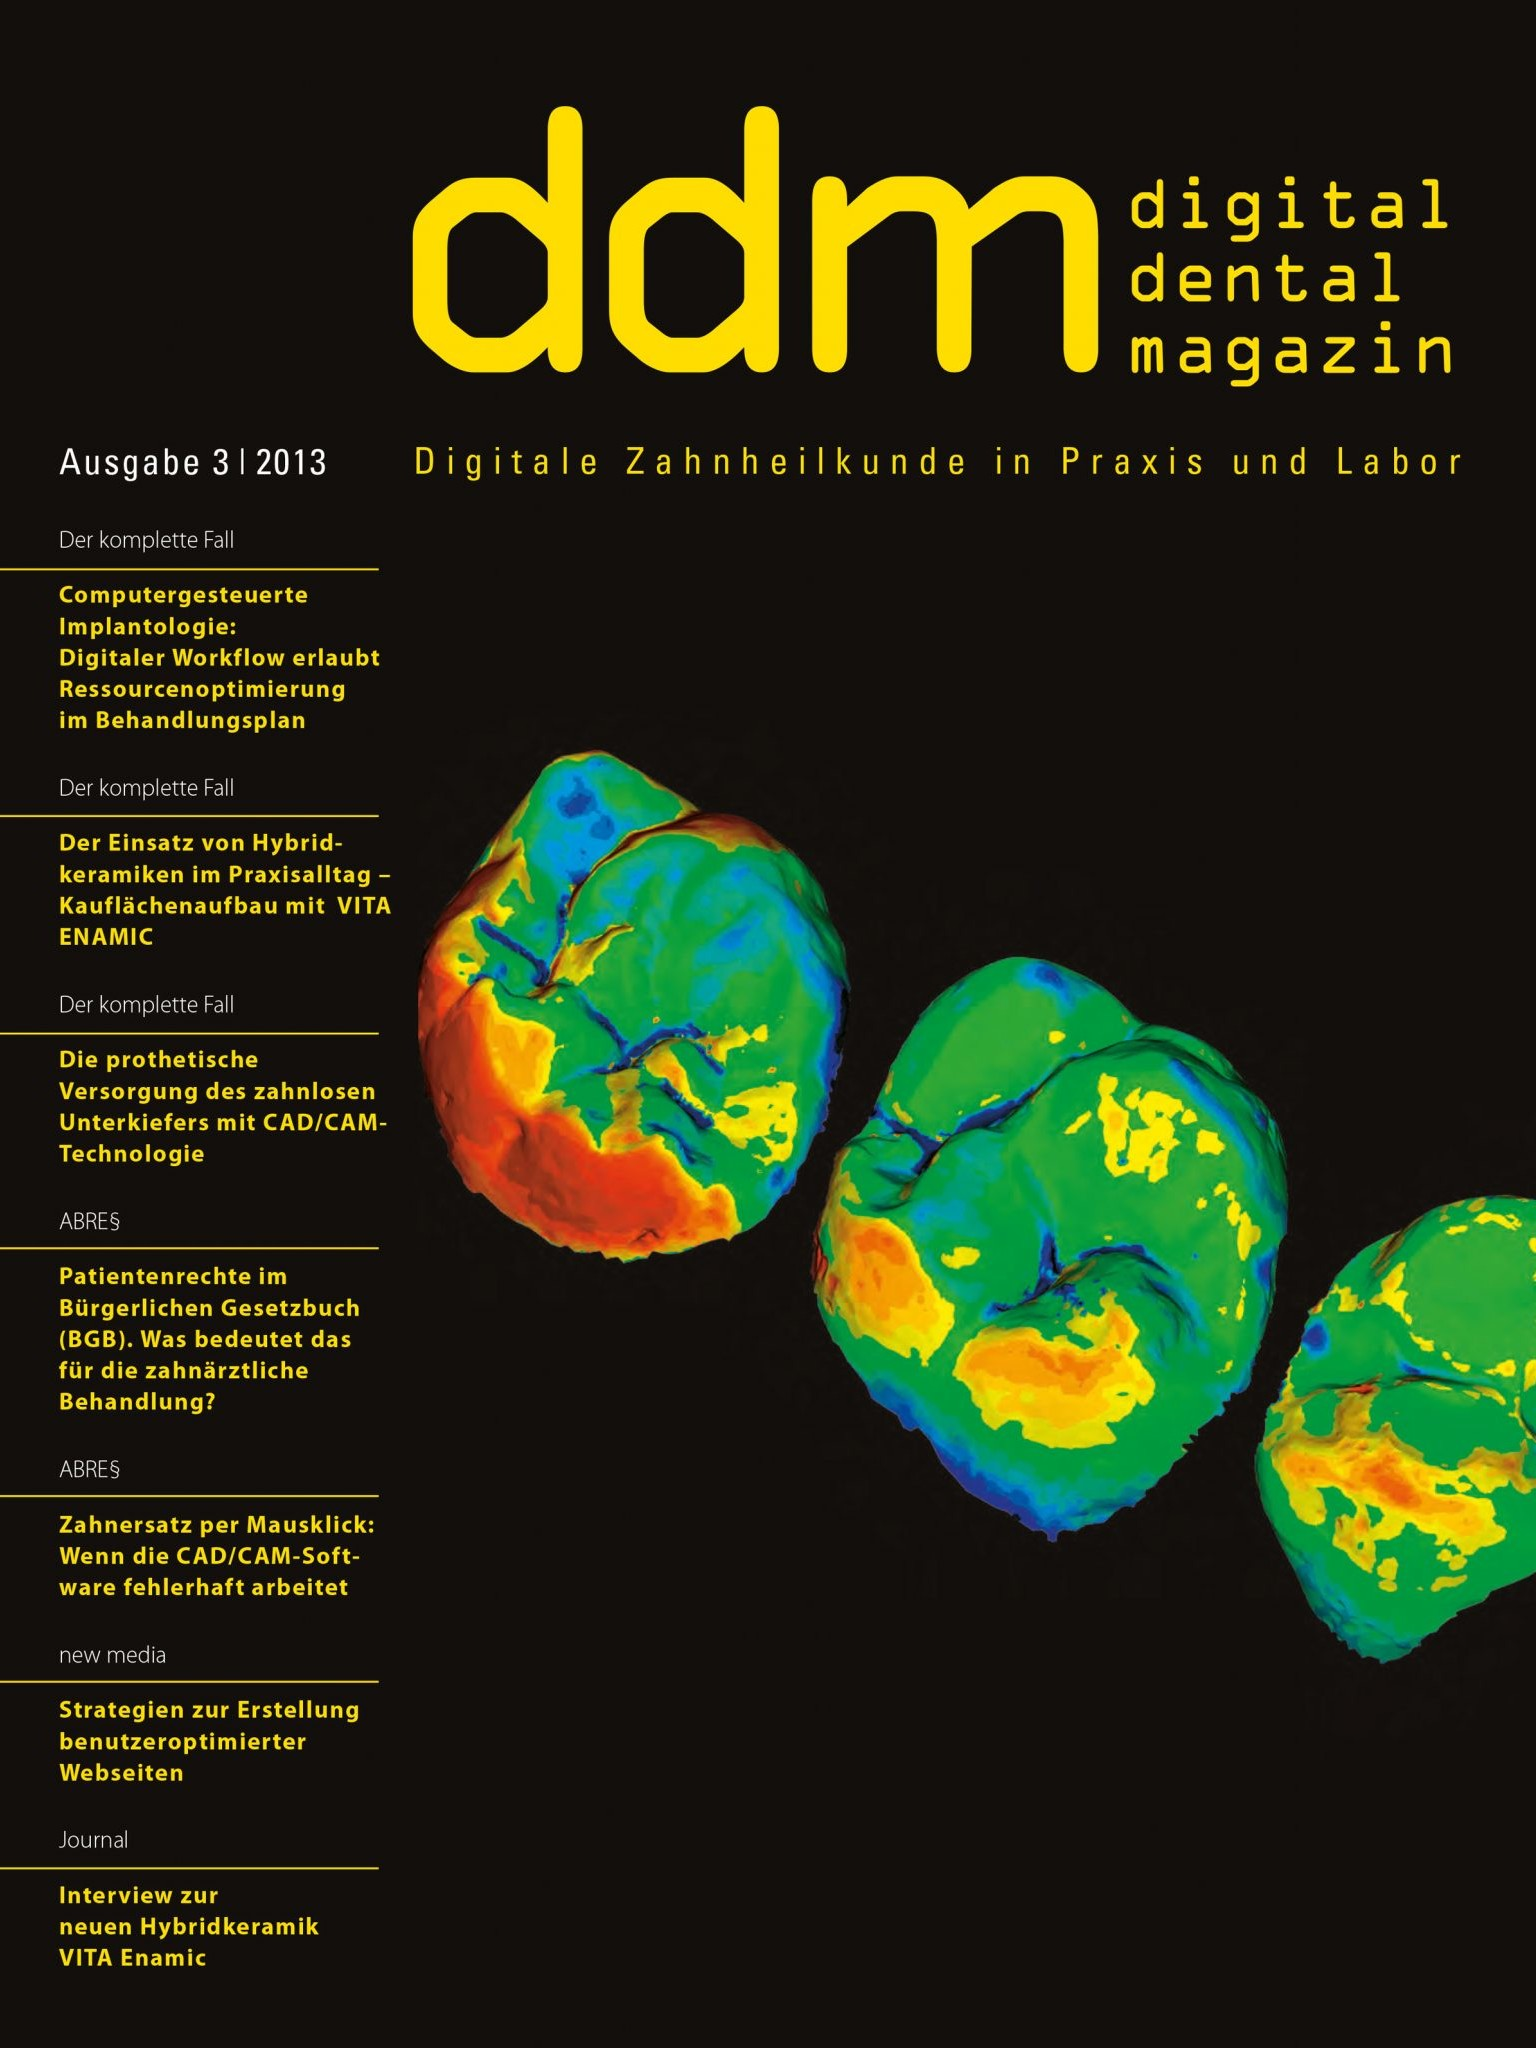 Deckblat-digital-dental-magazin-03_2013